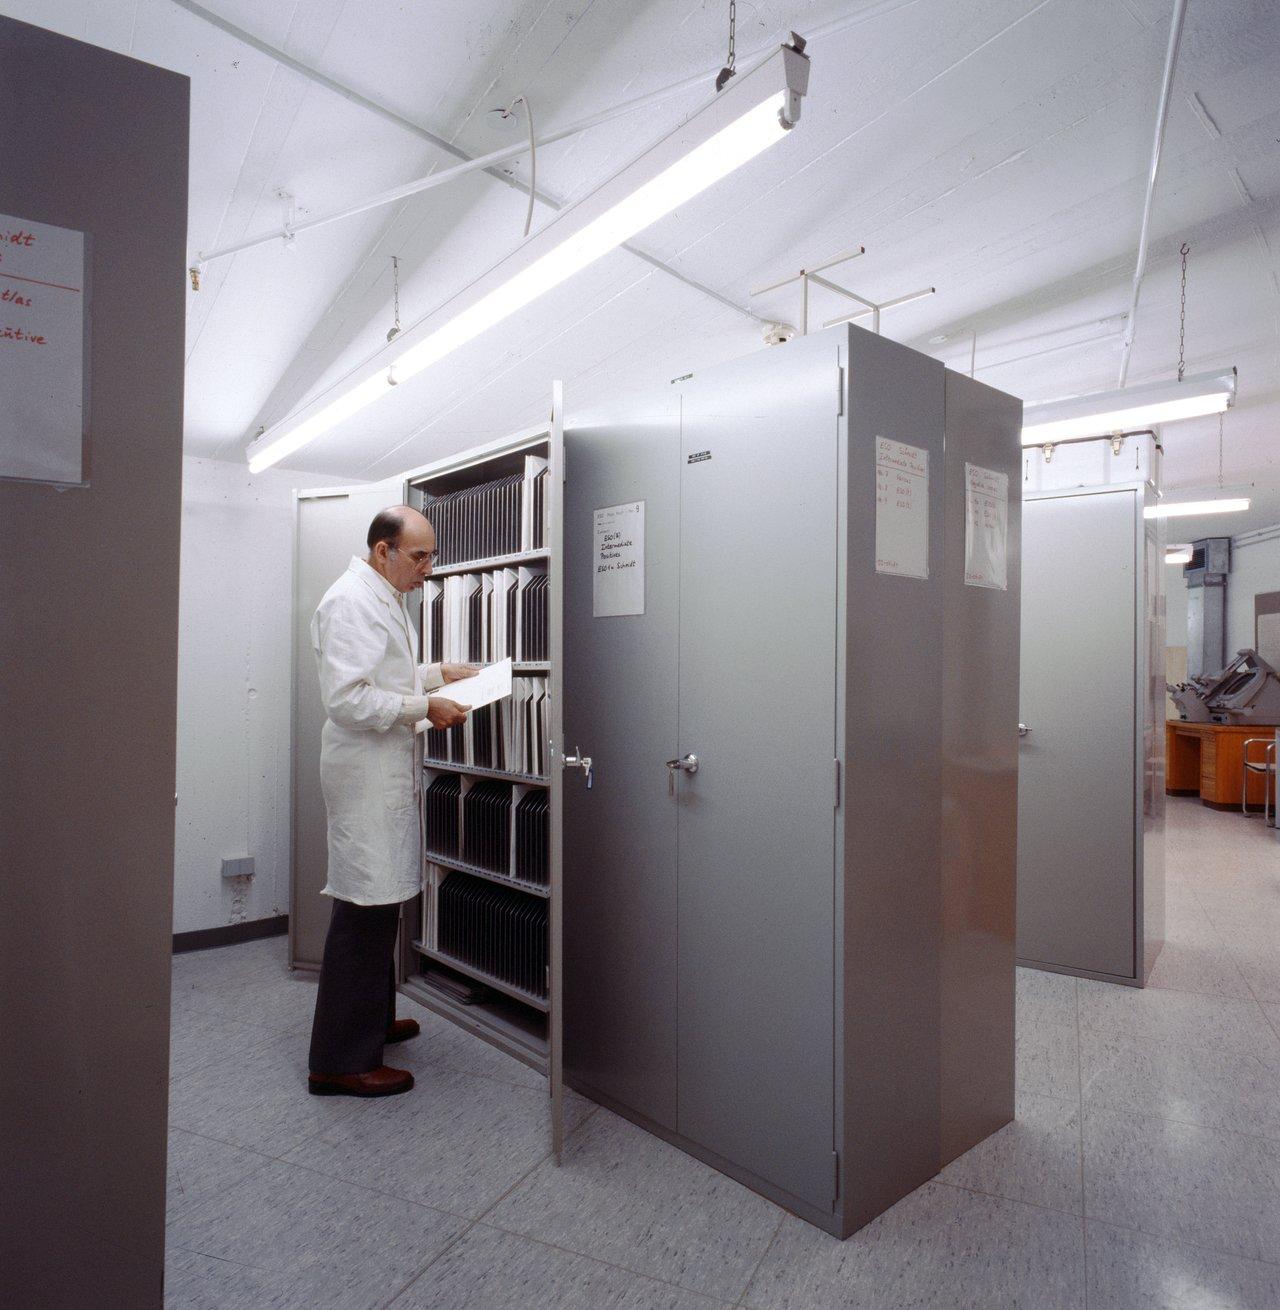 Sky Atlas Laboratory